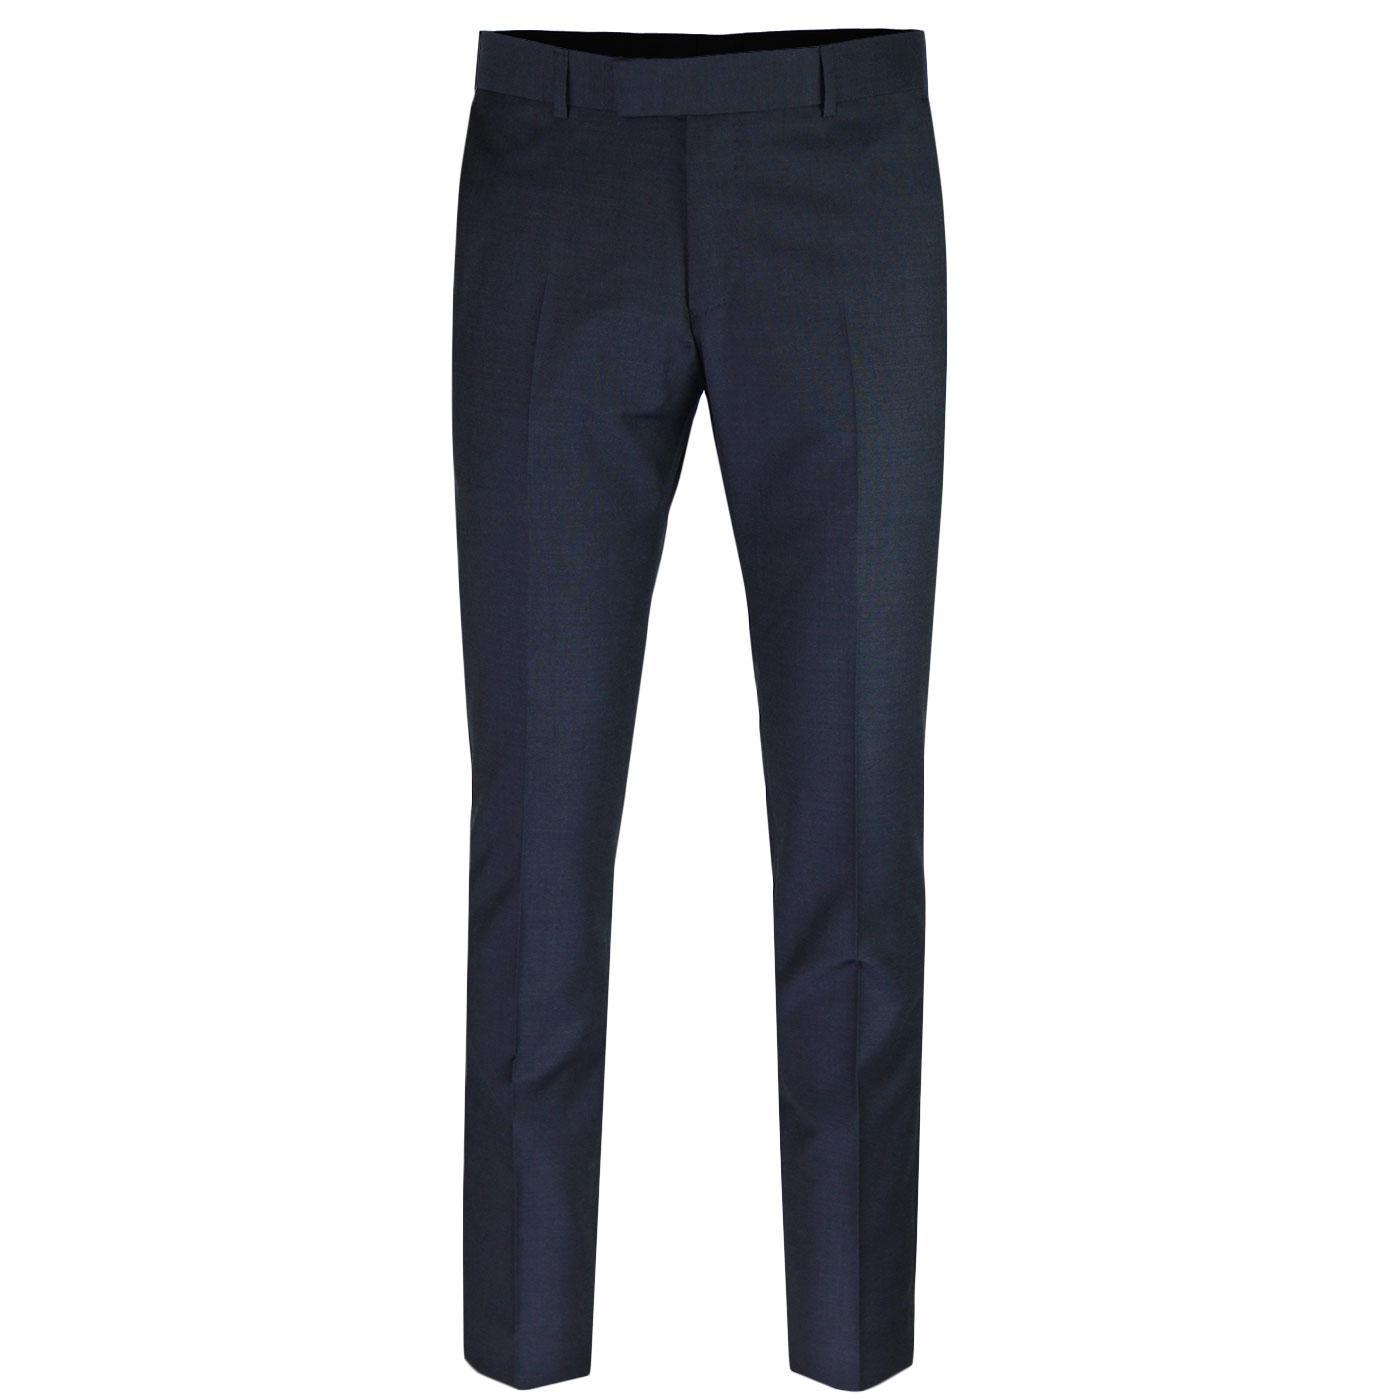 MADCAP ENGLAND Mod Mohair Tonic Trousers (Navy)